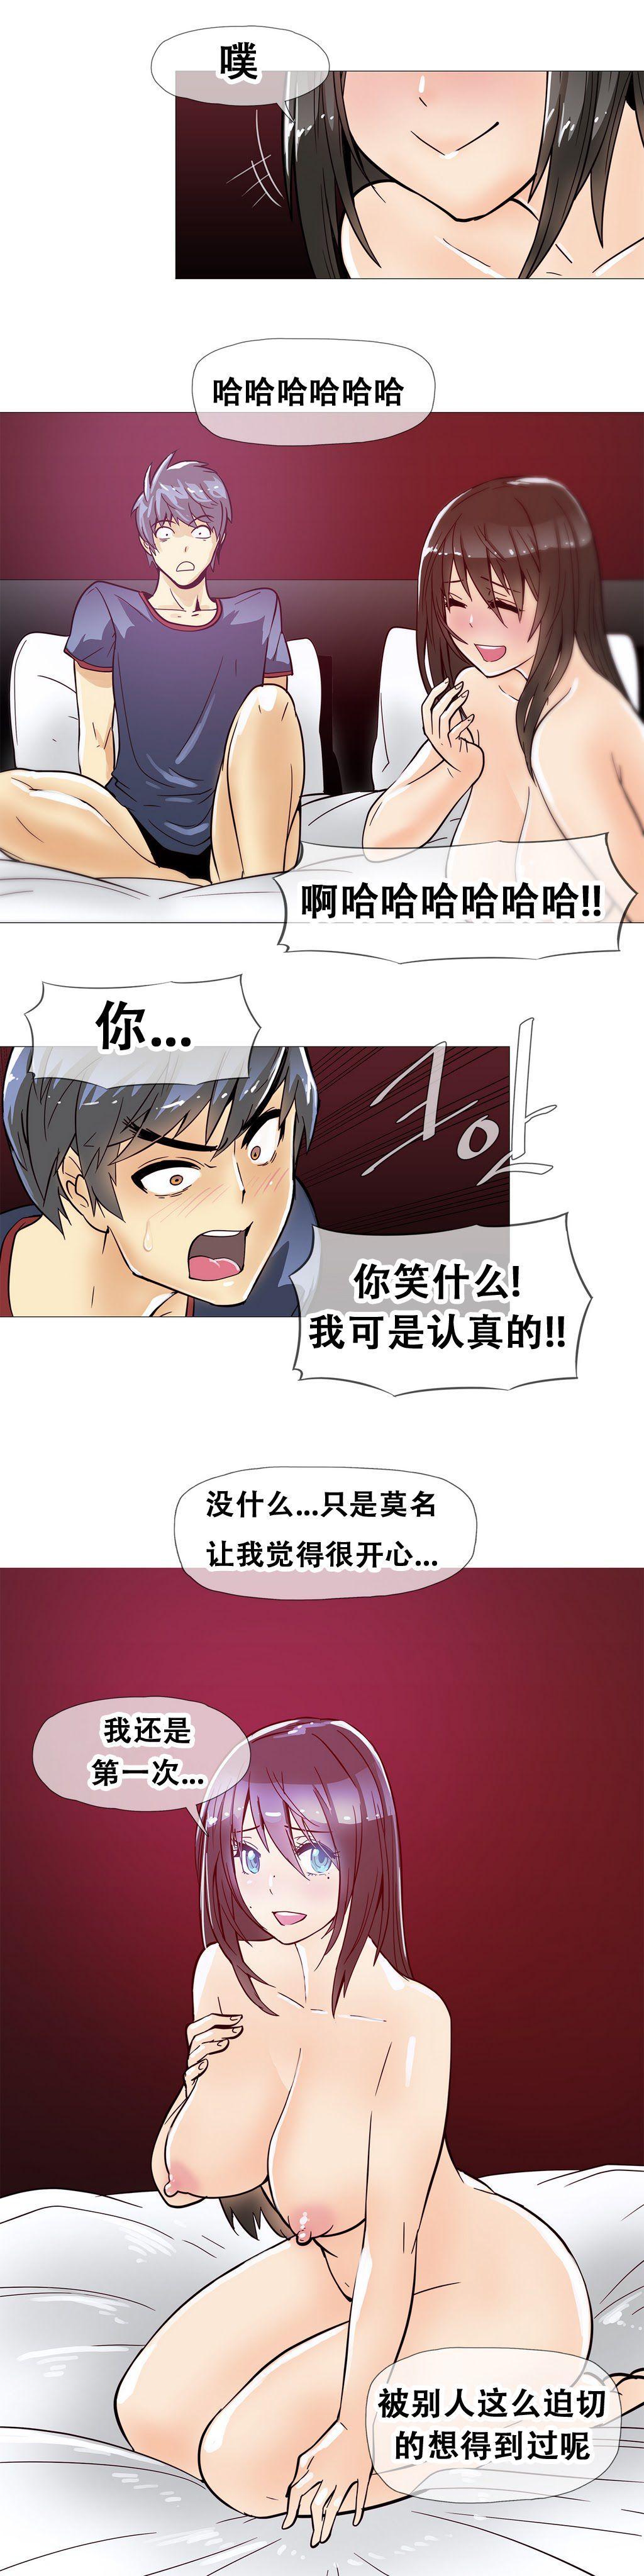 HouseHold Affairs 【卞赤鲤个人汉化】1~33话(持续更新中) 256